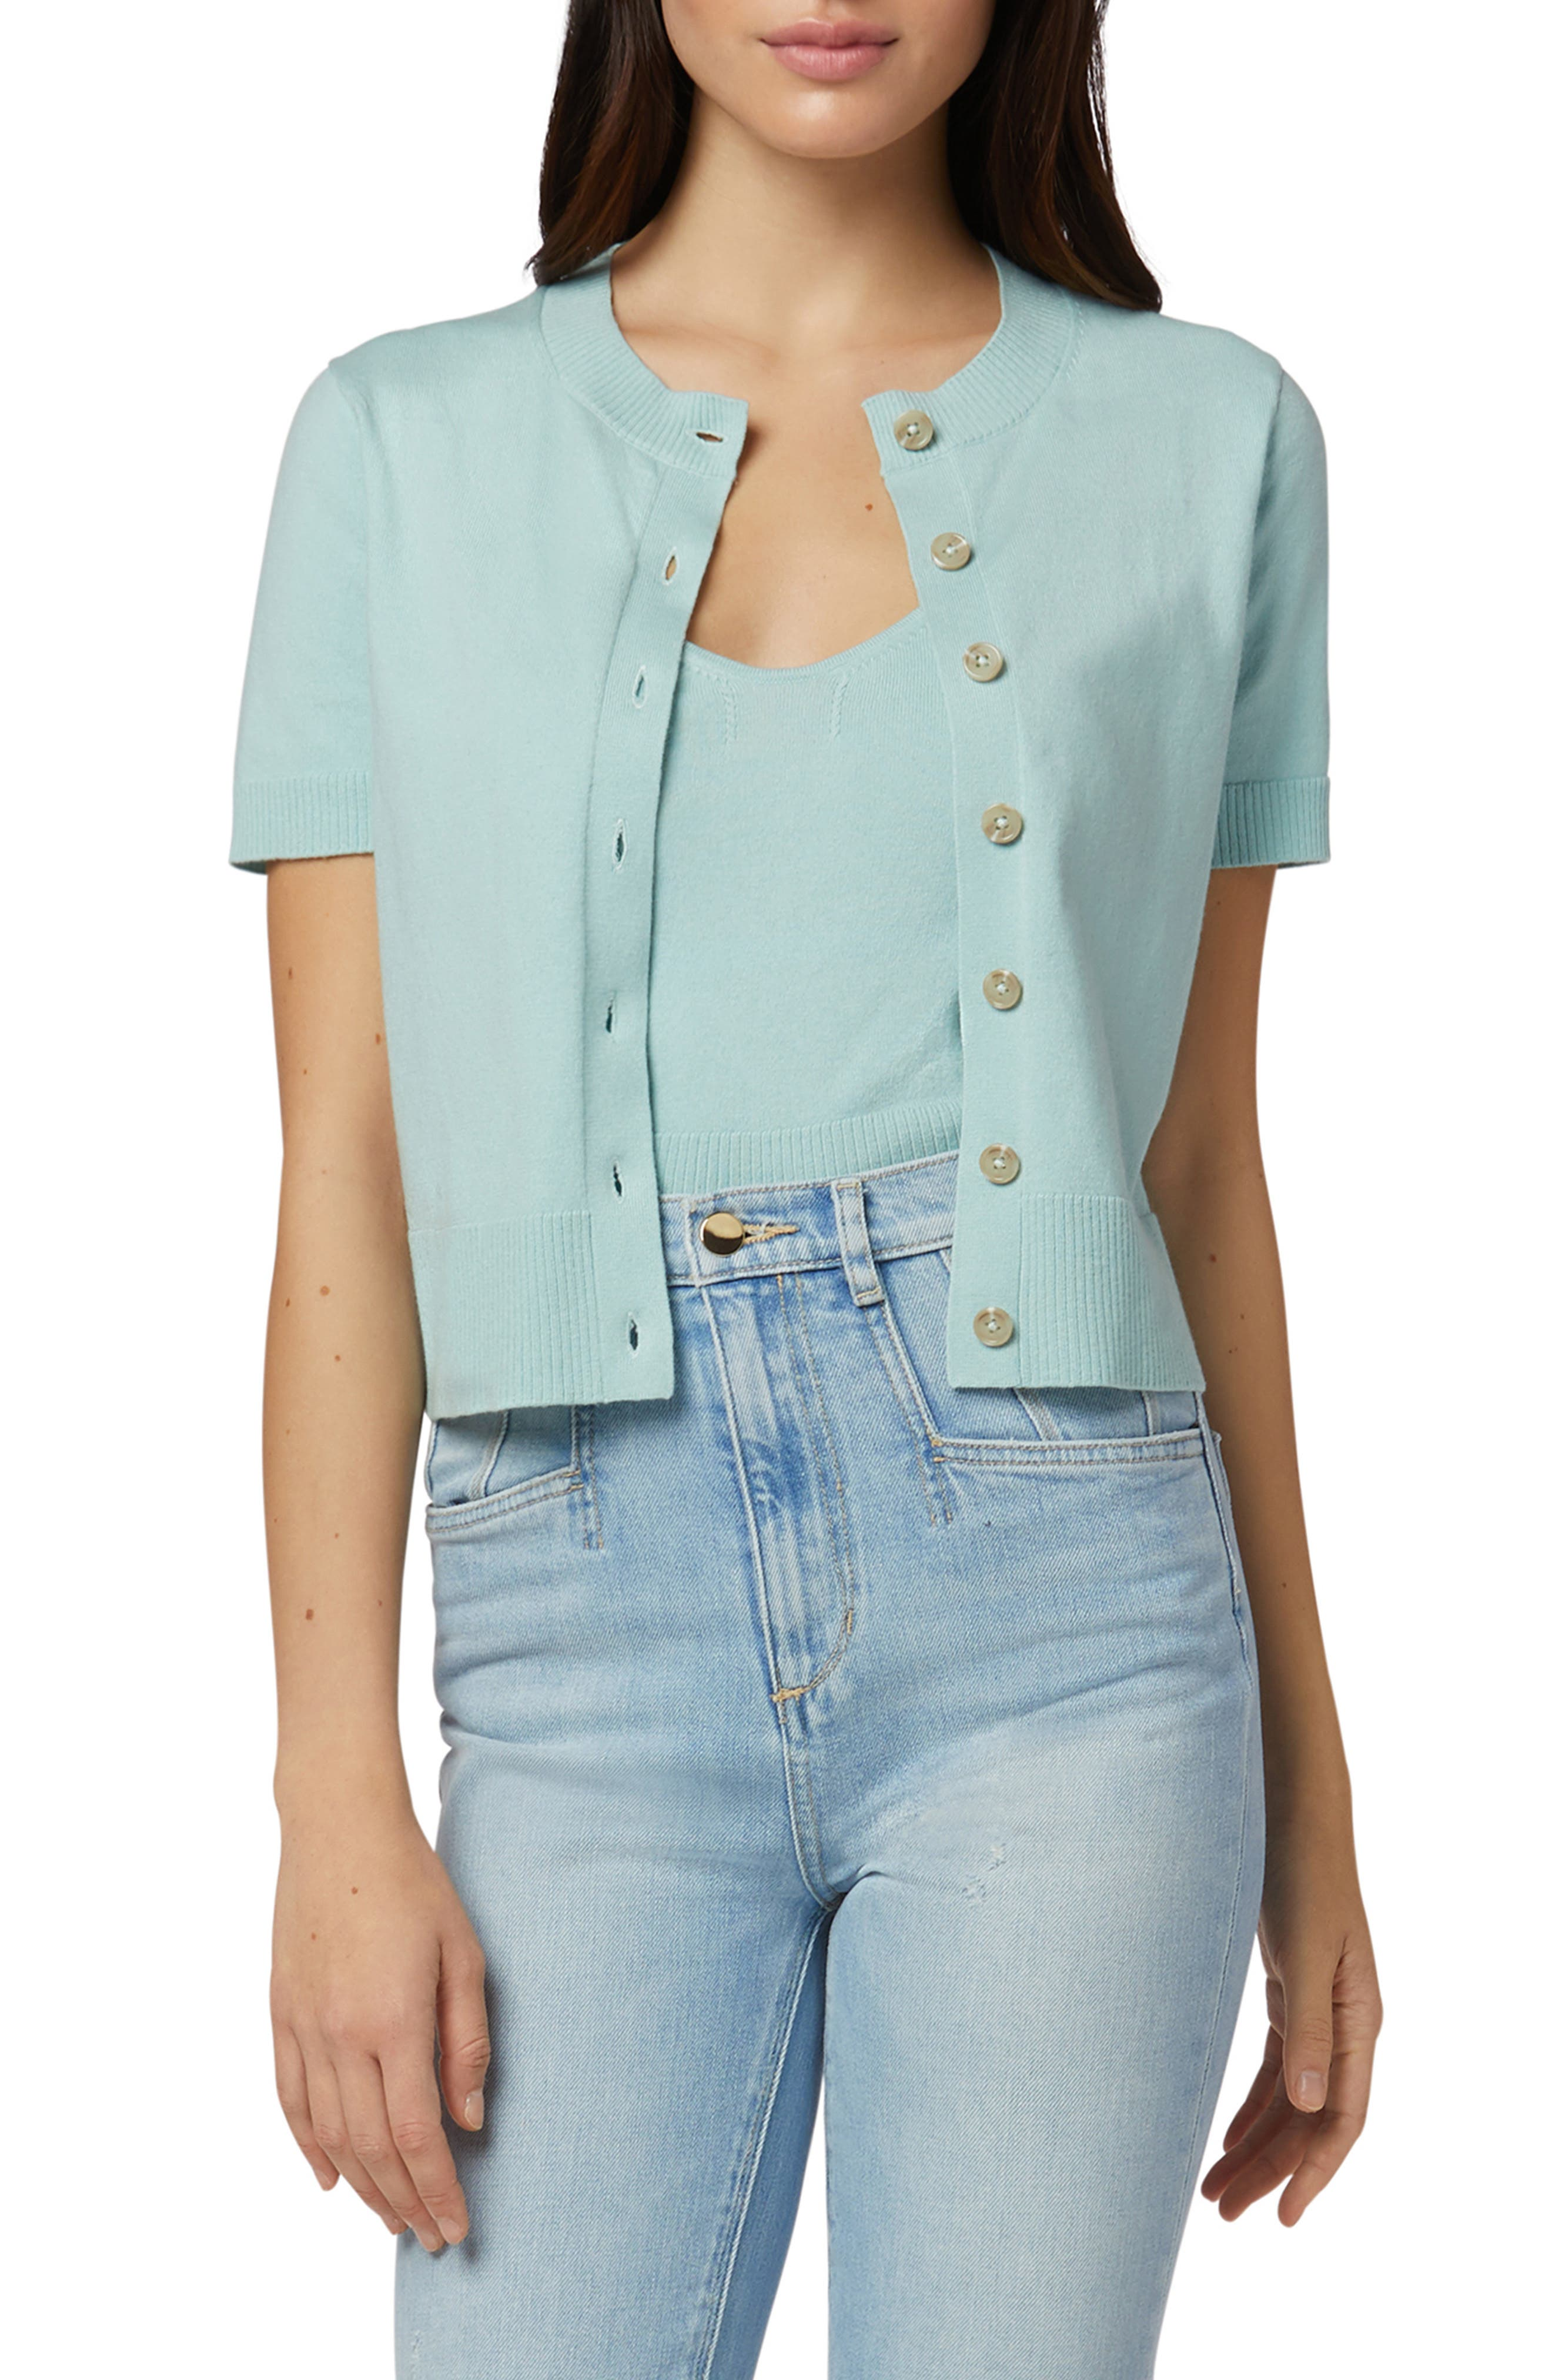 Cotton & Cashmere Short Sleeve Cardigan